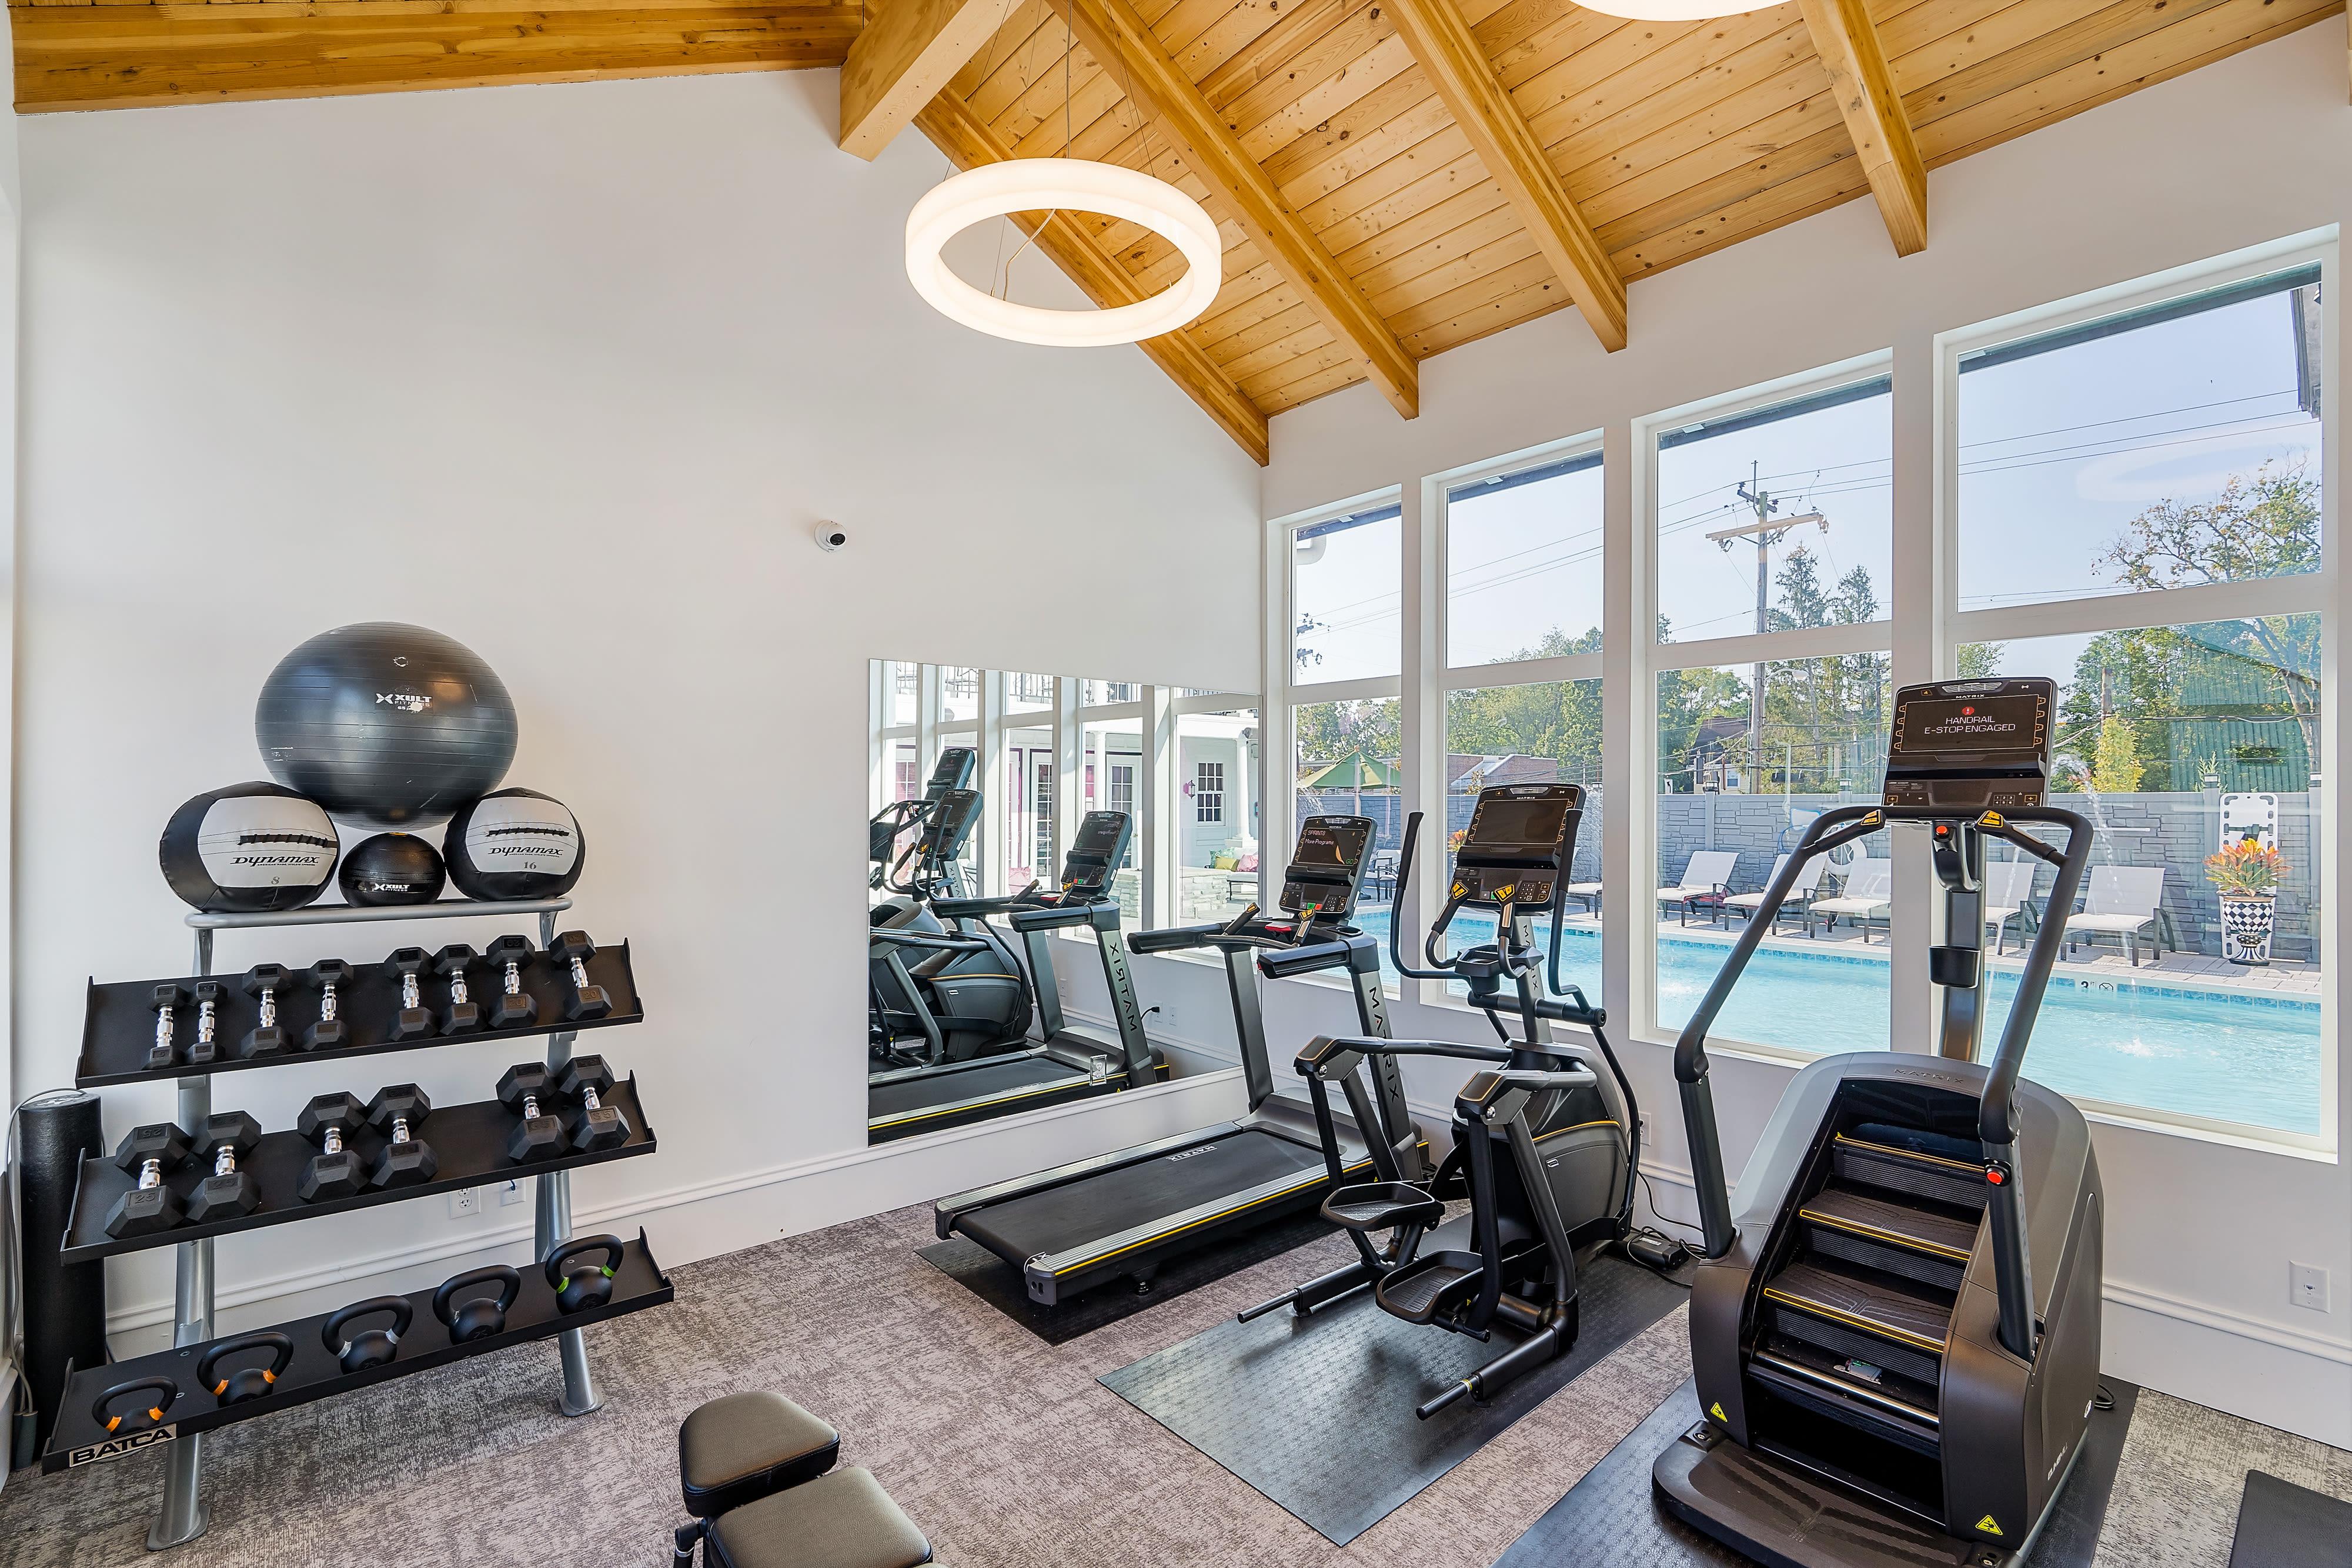 Fitness center at The Jameson in Cincinnati, Ohio